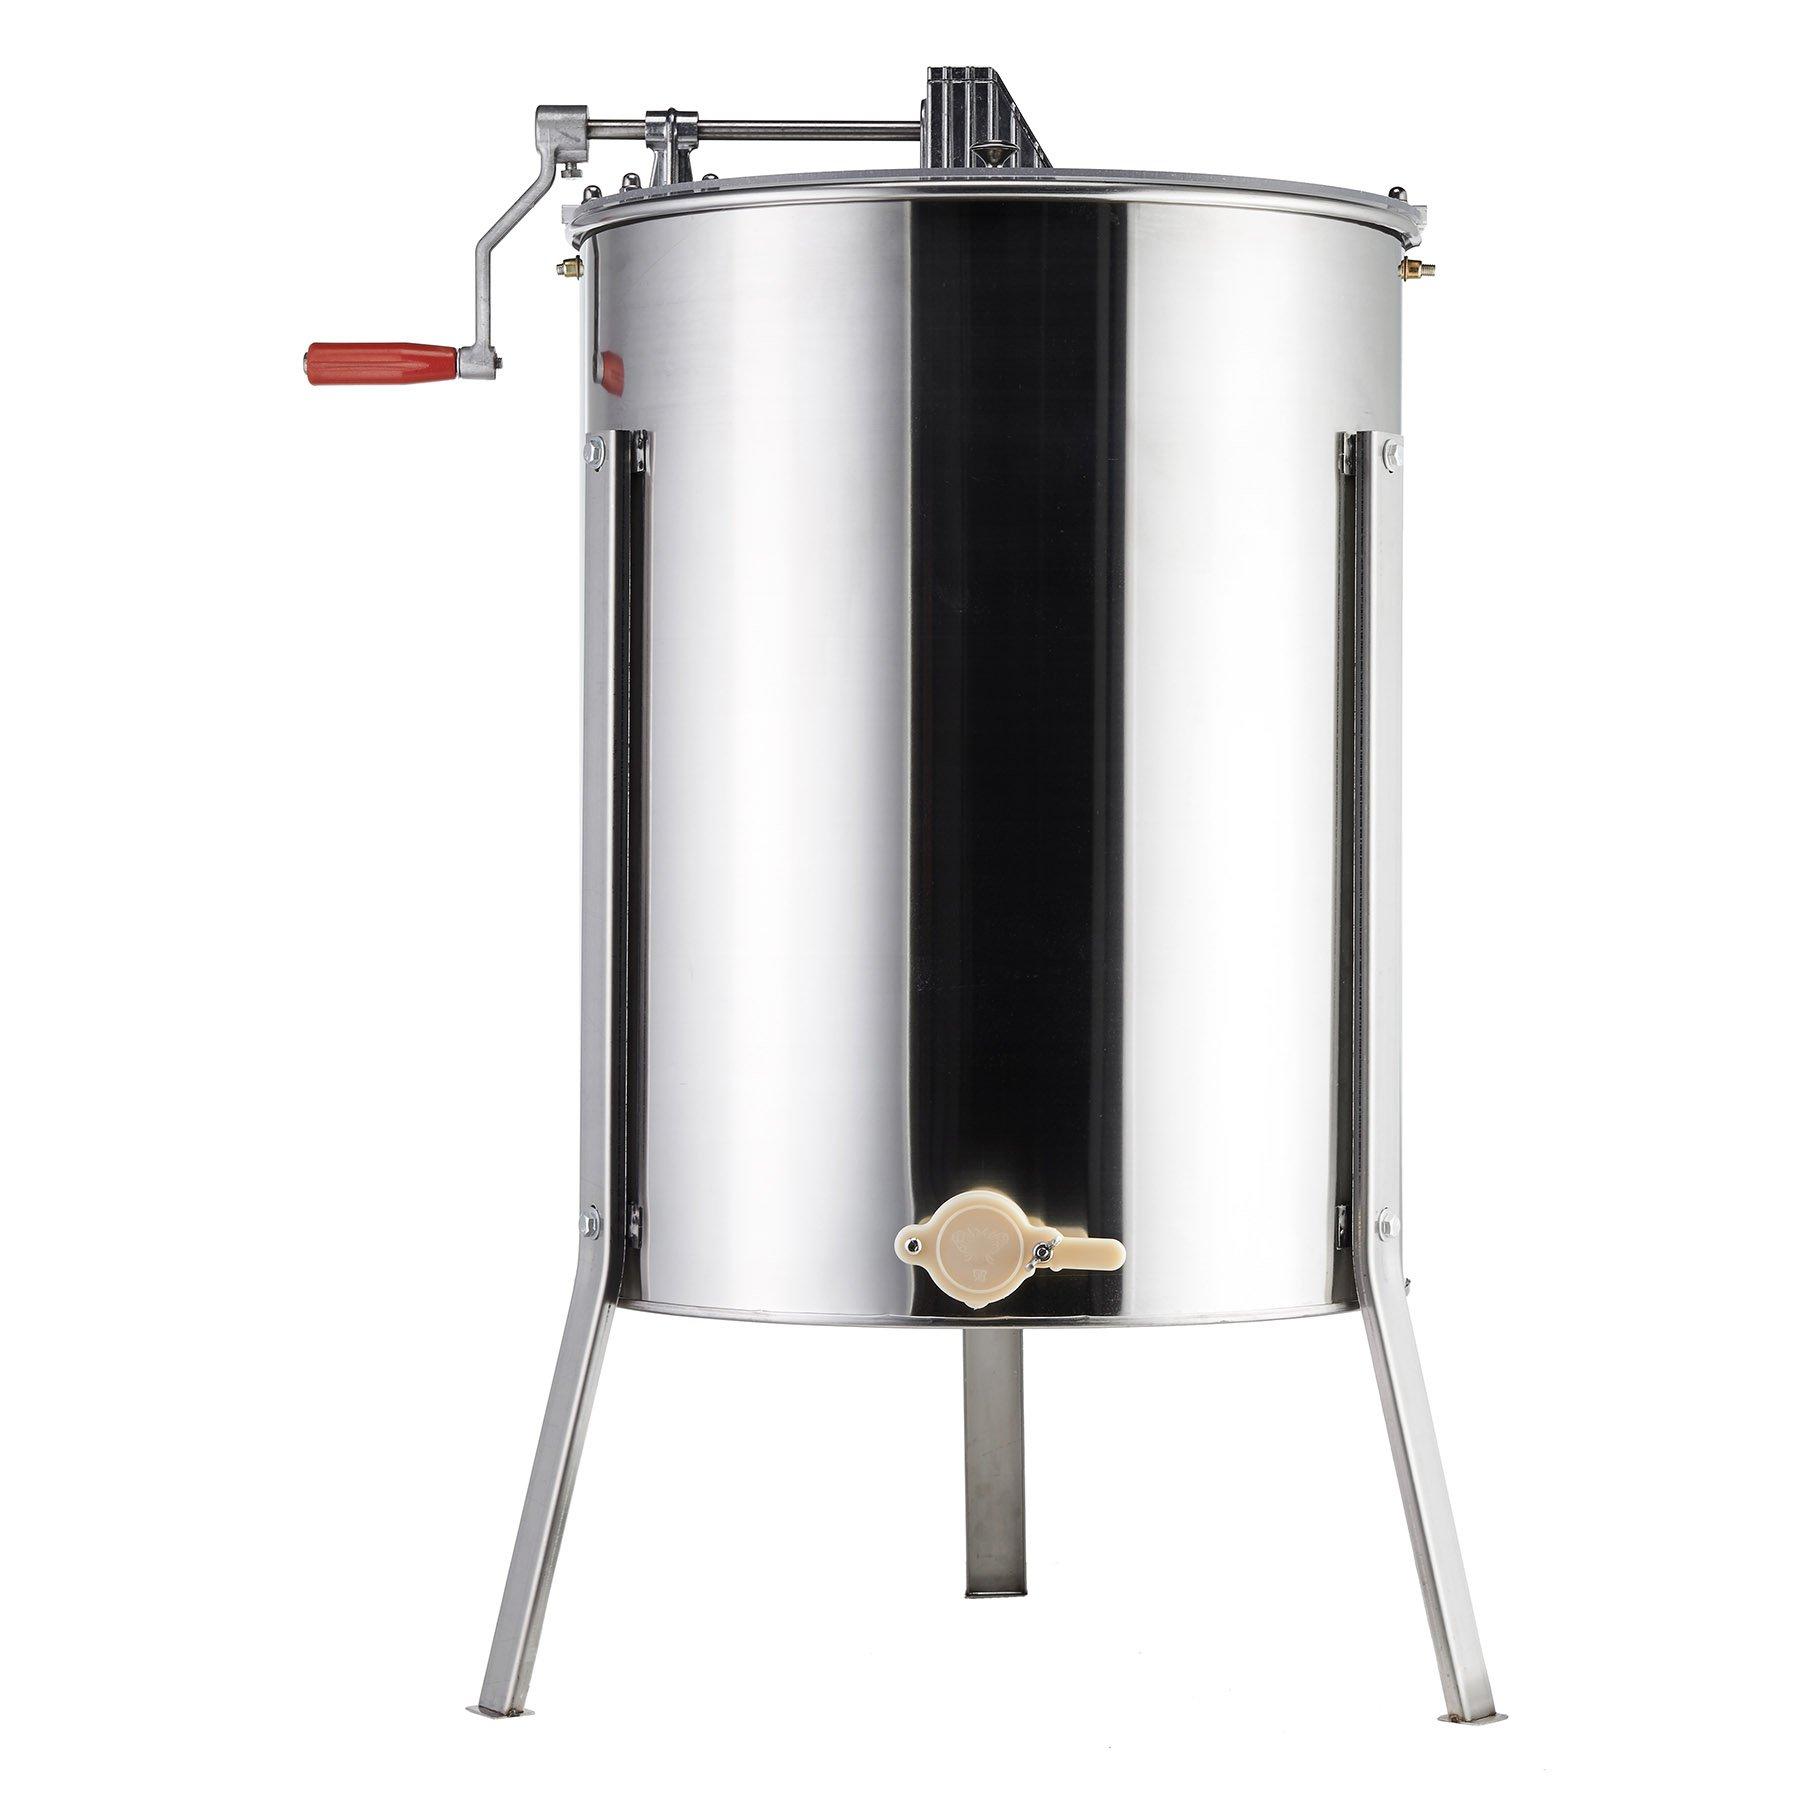 Tek Motion 4-Frame Large Stainless Steel Honey Extractor SS Beekeeping Equipment by Tek Motion (Image #1)